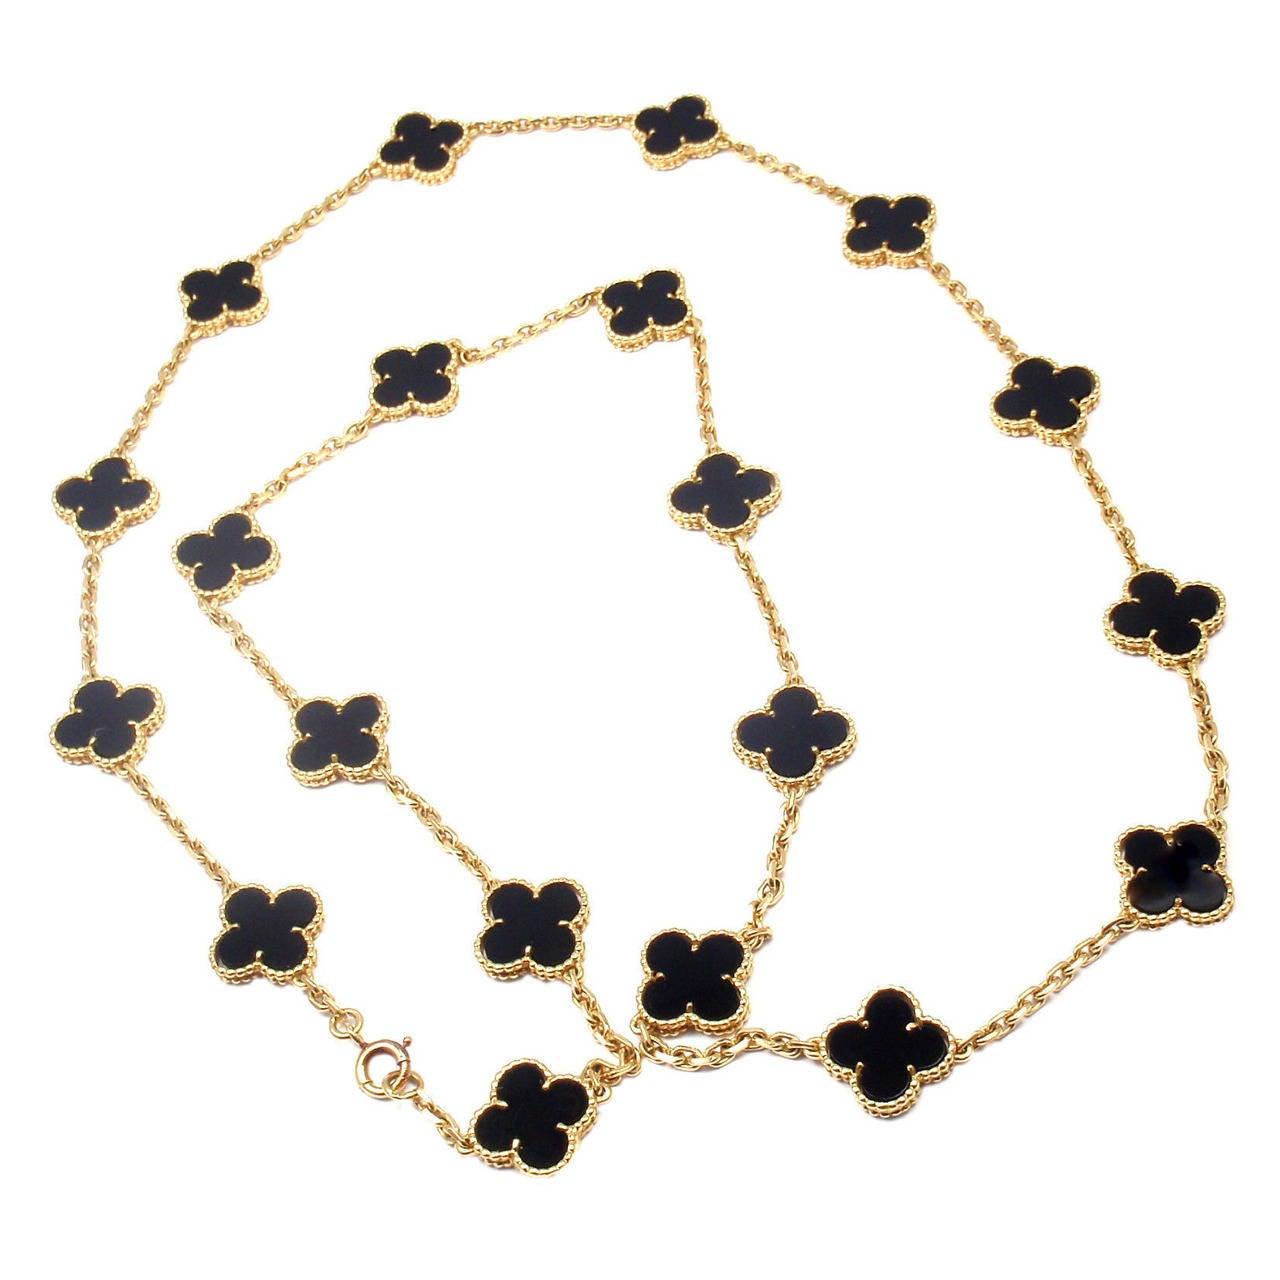 Van Cleef & Arpels Vintage Alhambra Twenty-Motif Black Onyx Gold Necklace 1